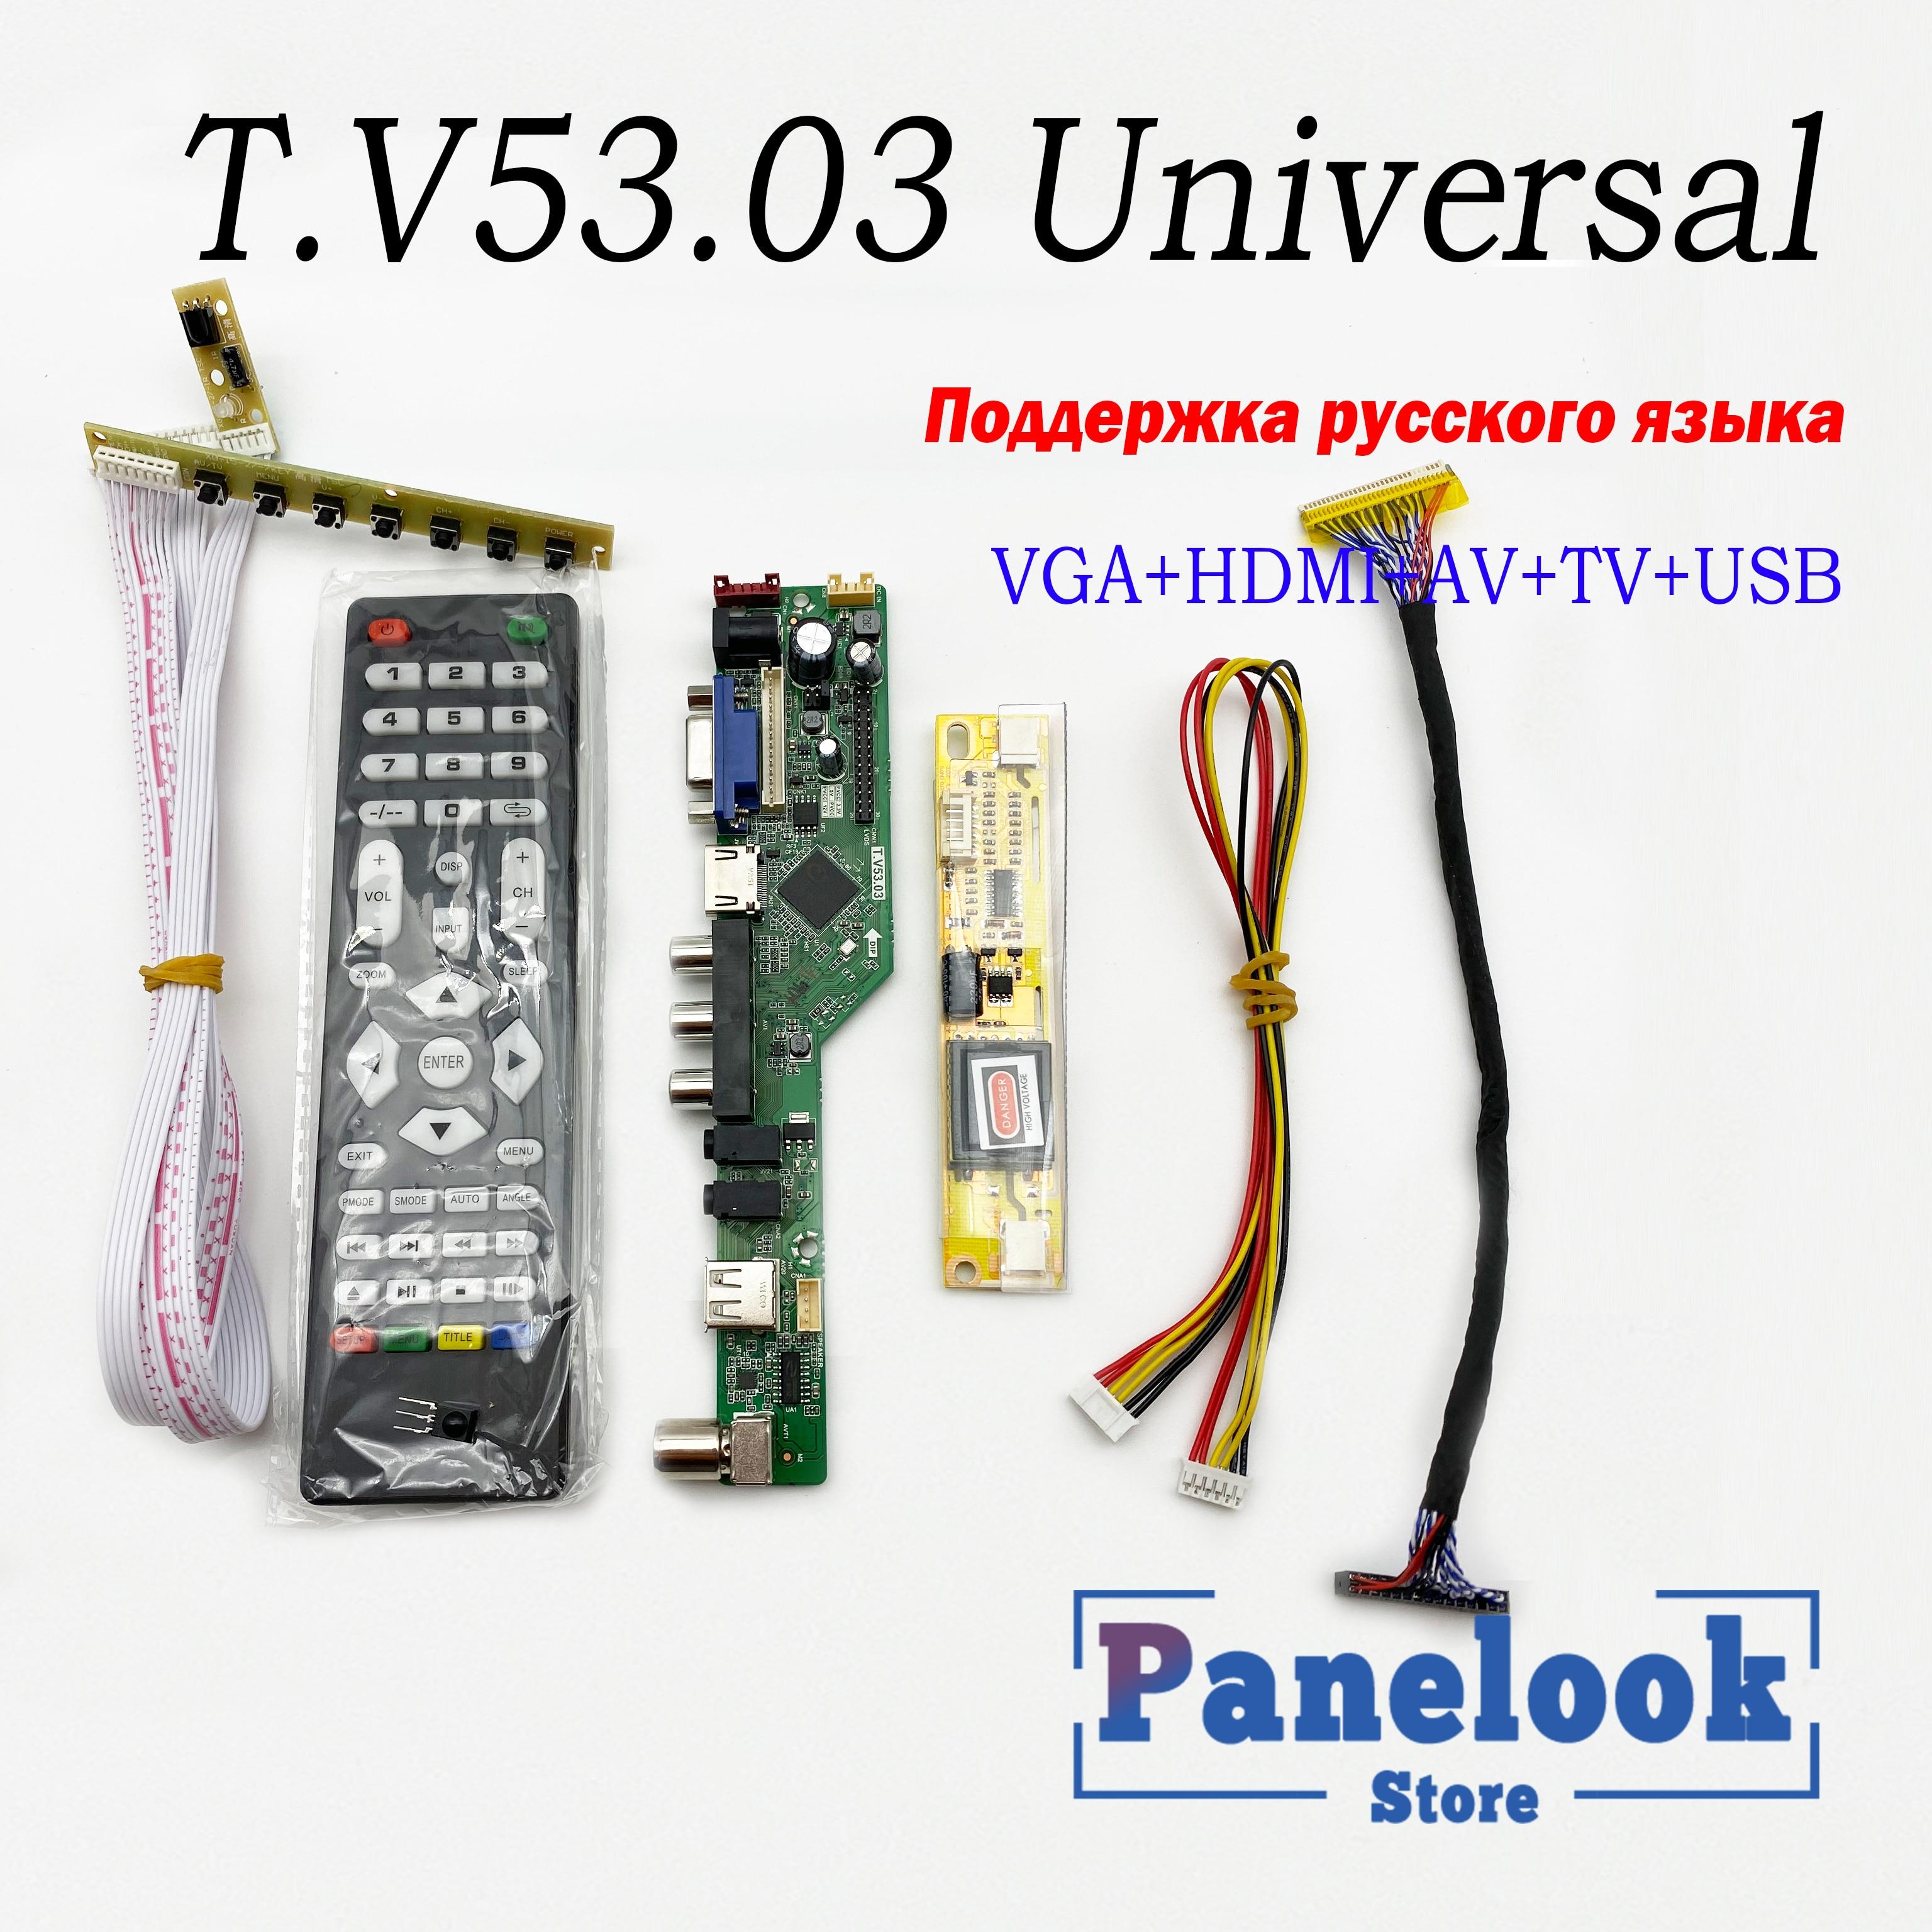 T.V53.03 Universal LCD TV Controller Driver Board PC/VGA/HDMI/USB Interface+7 key board+ 2 Lamp inverter